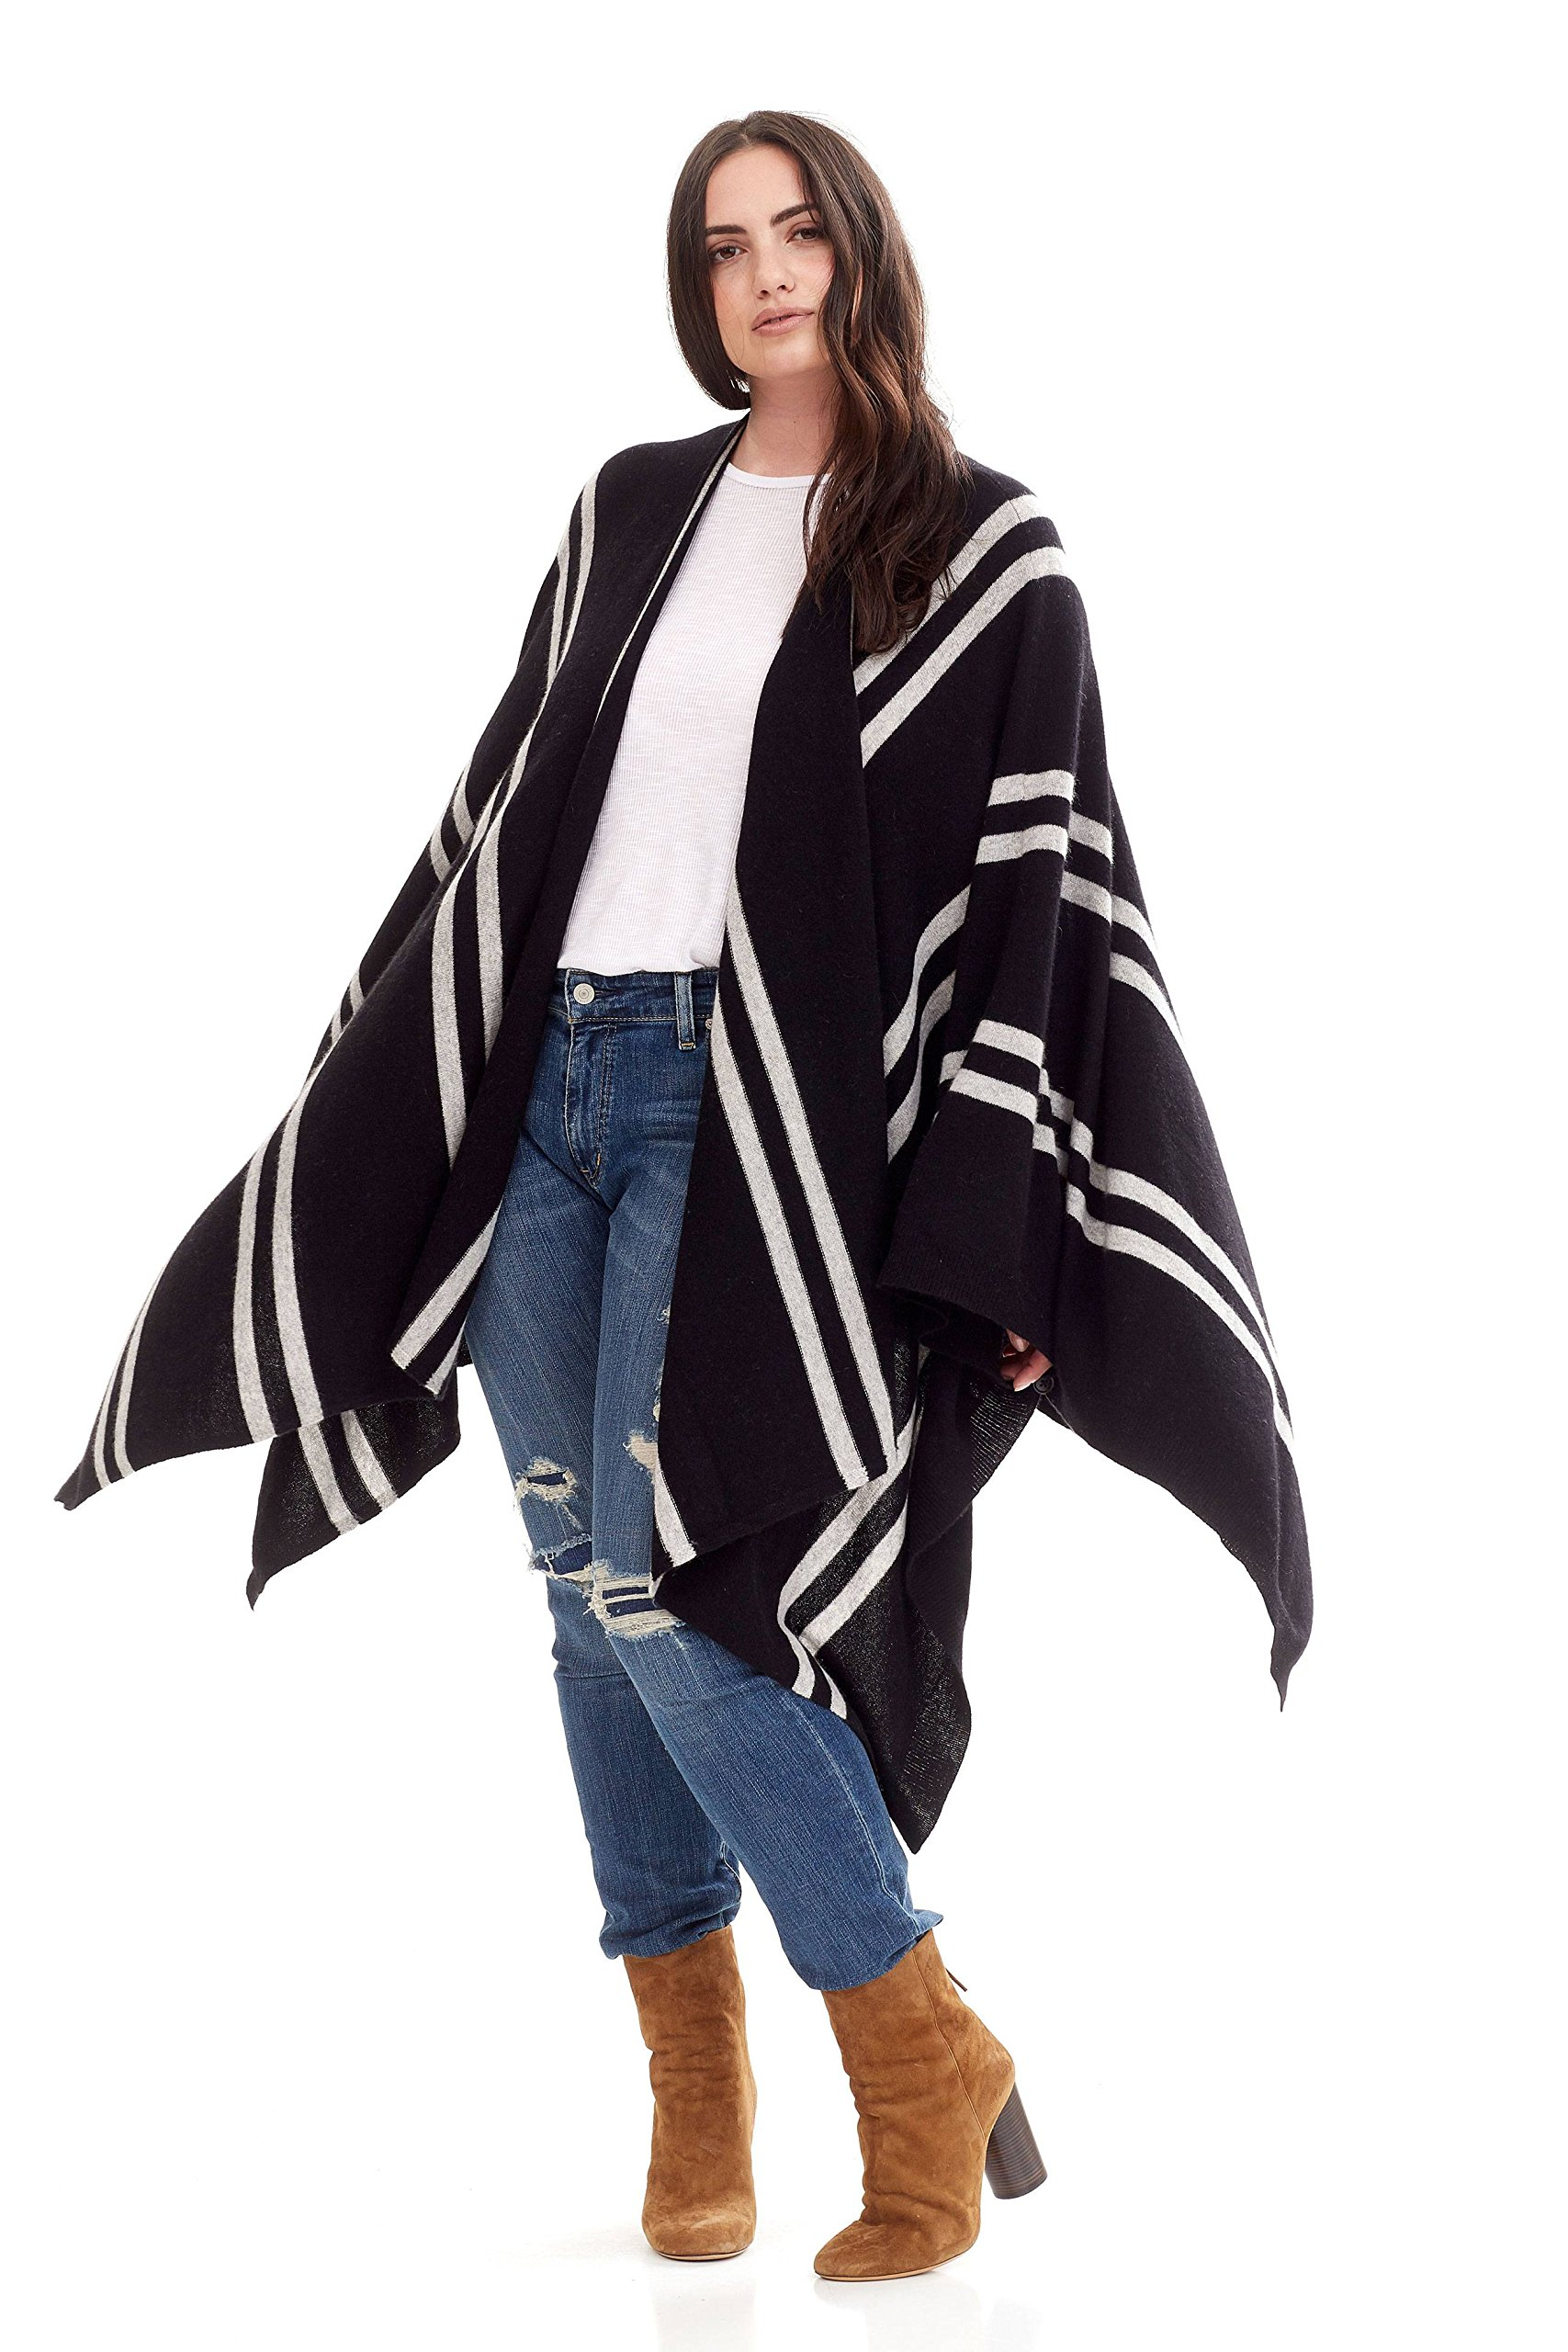 NAKEDCASHMERE Women's Adele Wrap O/S Black/Heather Grey Stripes by NAKEDCASHMERE